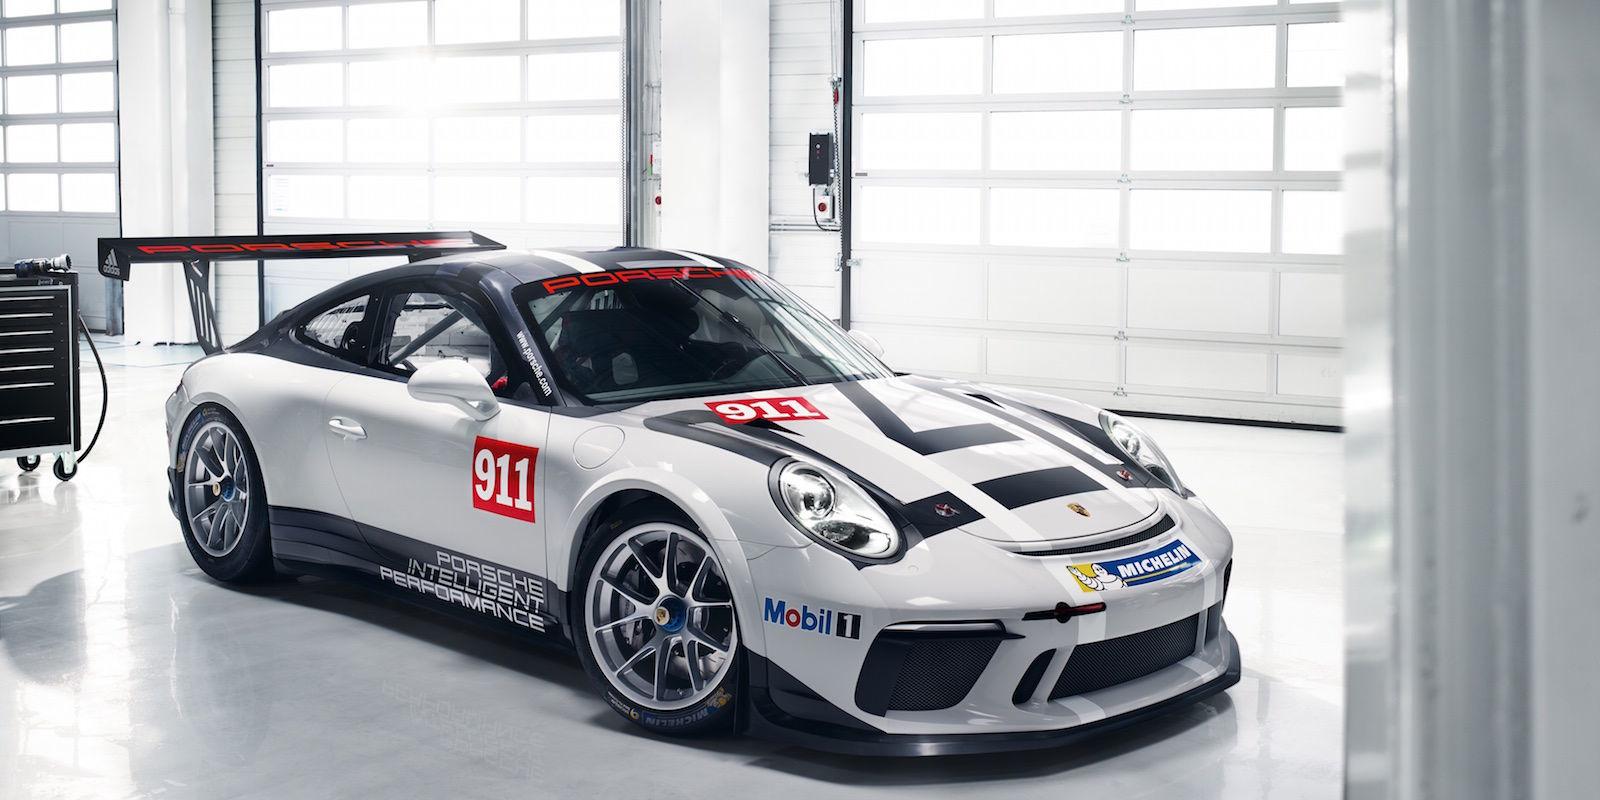 2017 Porsche 911 Gt3 Cup Racecar